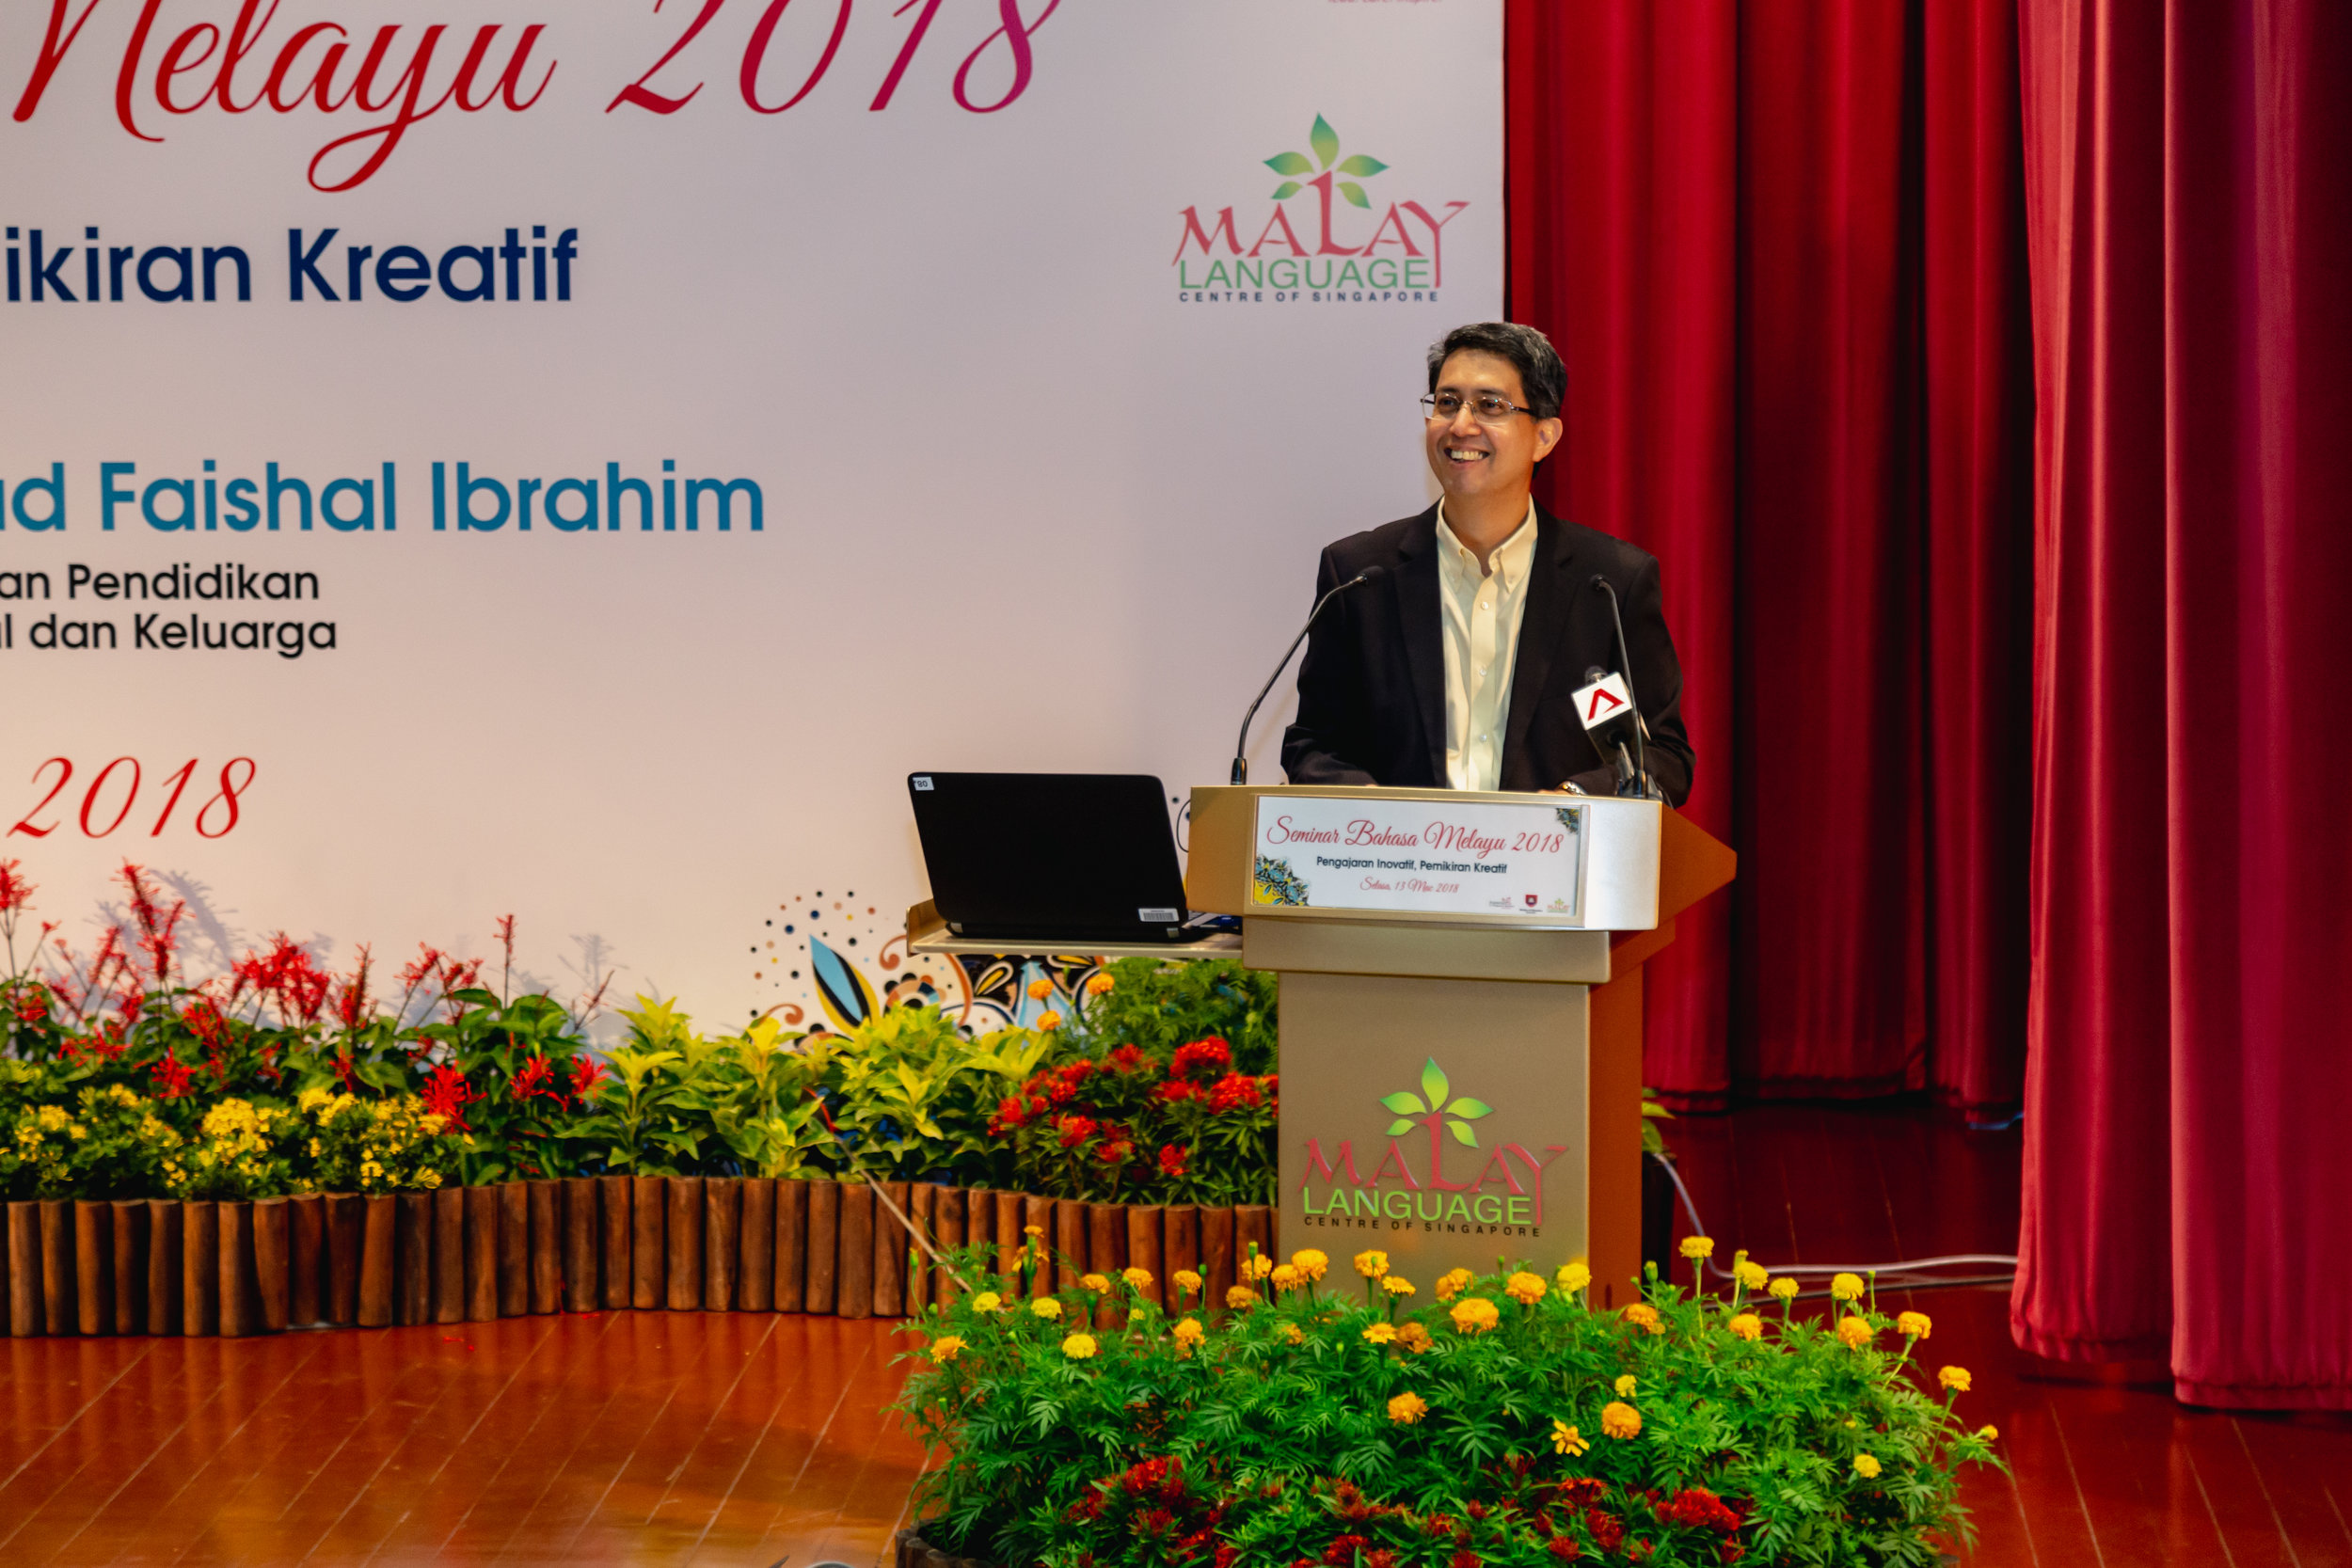 MLCS Seminar Bahasa Melayu 2018